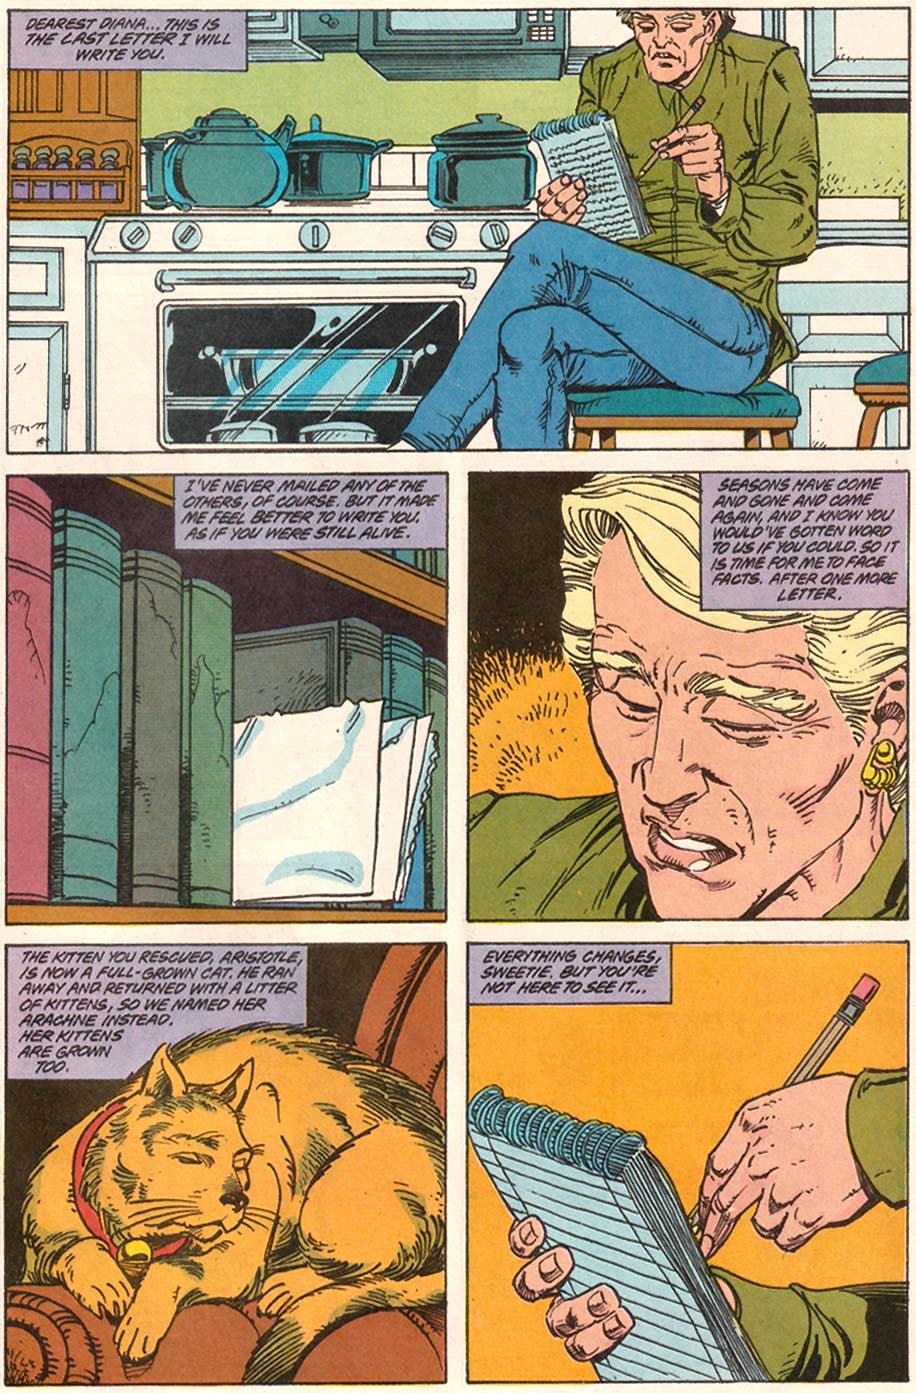 Read online Wonder Woman (1987) comic -  Issue #71 - 18